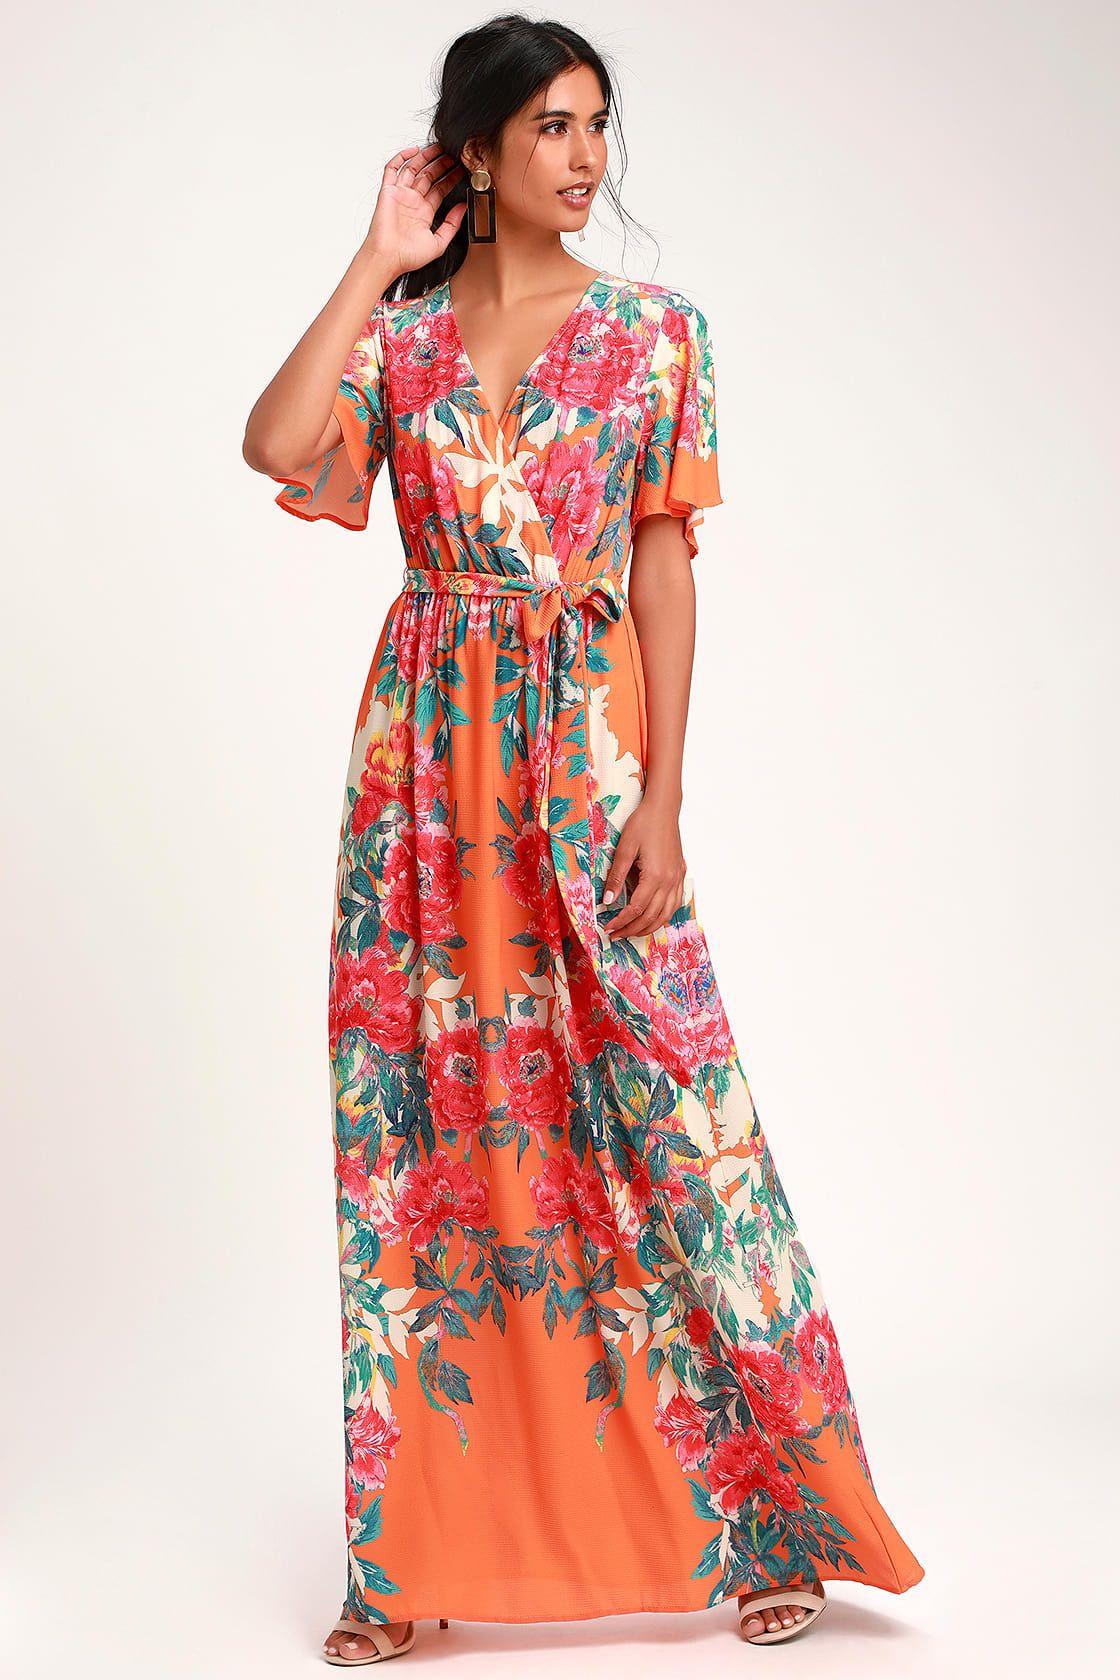 Orange Maxi Dresses,orange maxi dress,